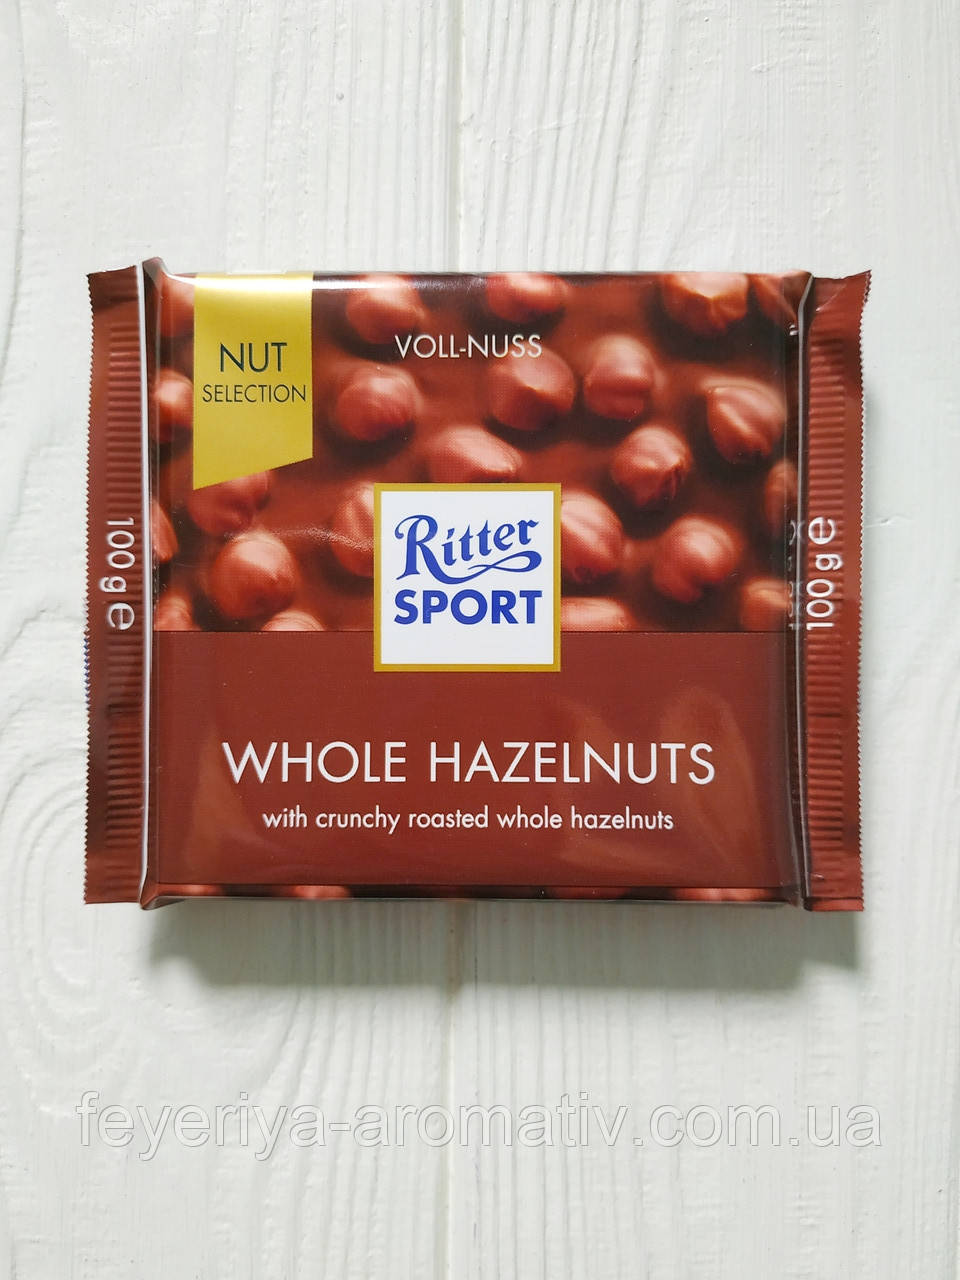 Шоколад Ritter Sport 100гр. (Германия) Whole Hazelnuts (молочны с цельным фундуком)